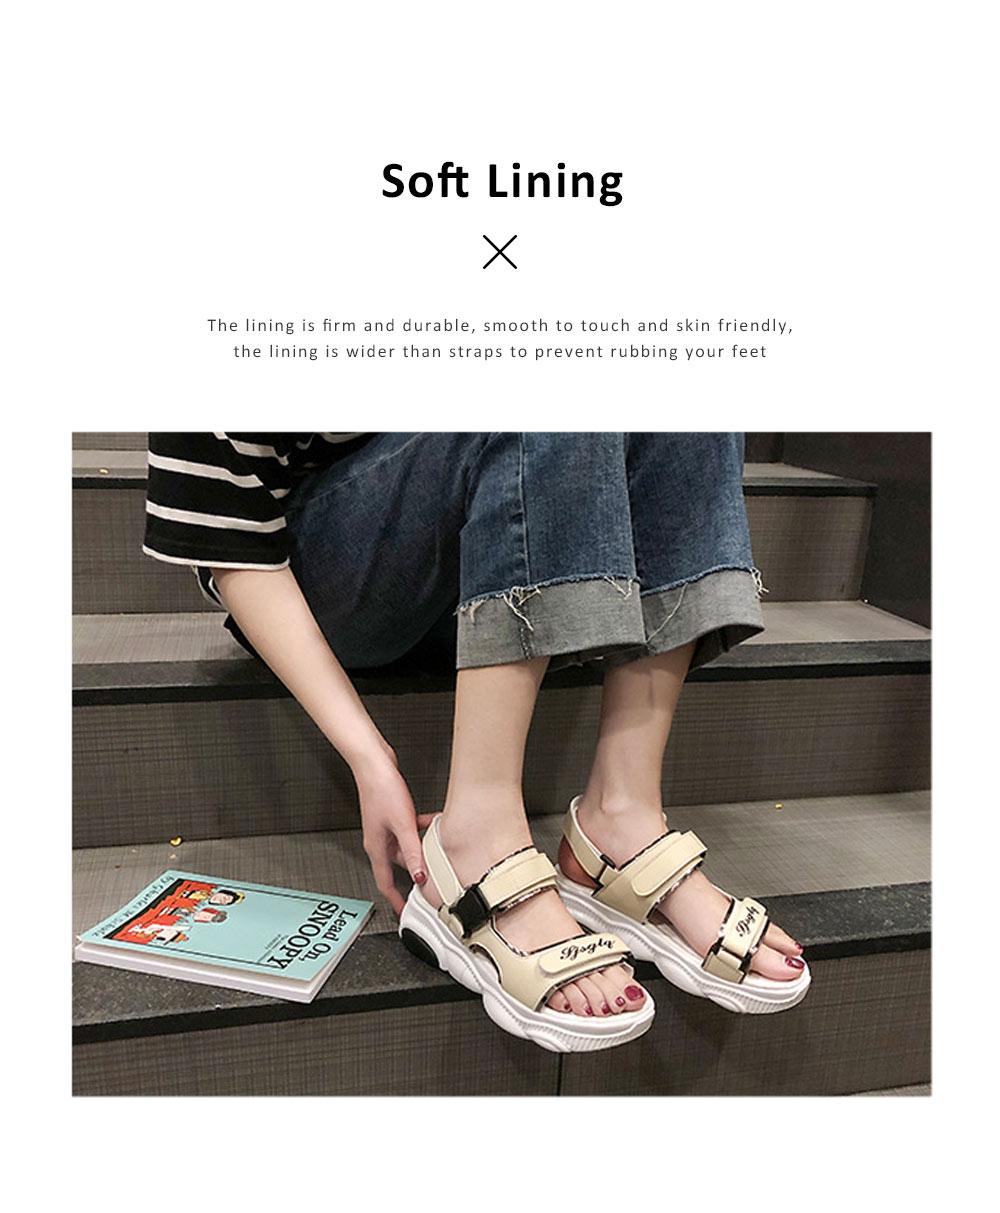 Women Scandal Elastic Adjustable Velcro Strap Shoe Breathable Athletic Open Toe Shoe Bear Bottom for Walking Running 5